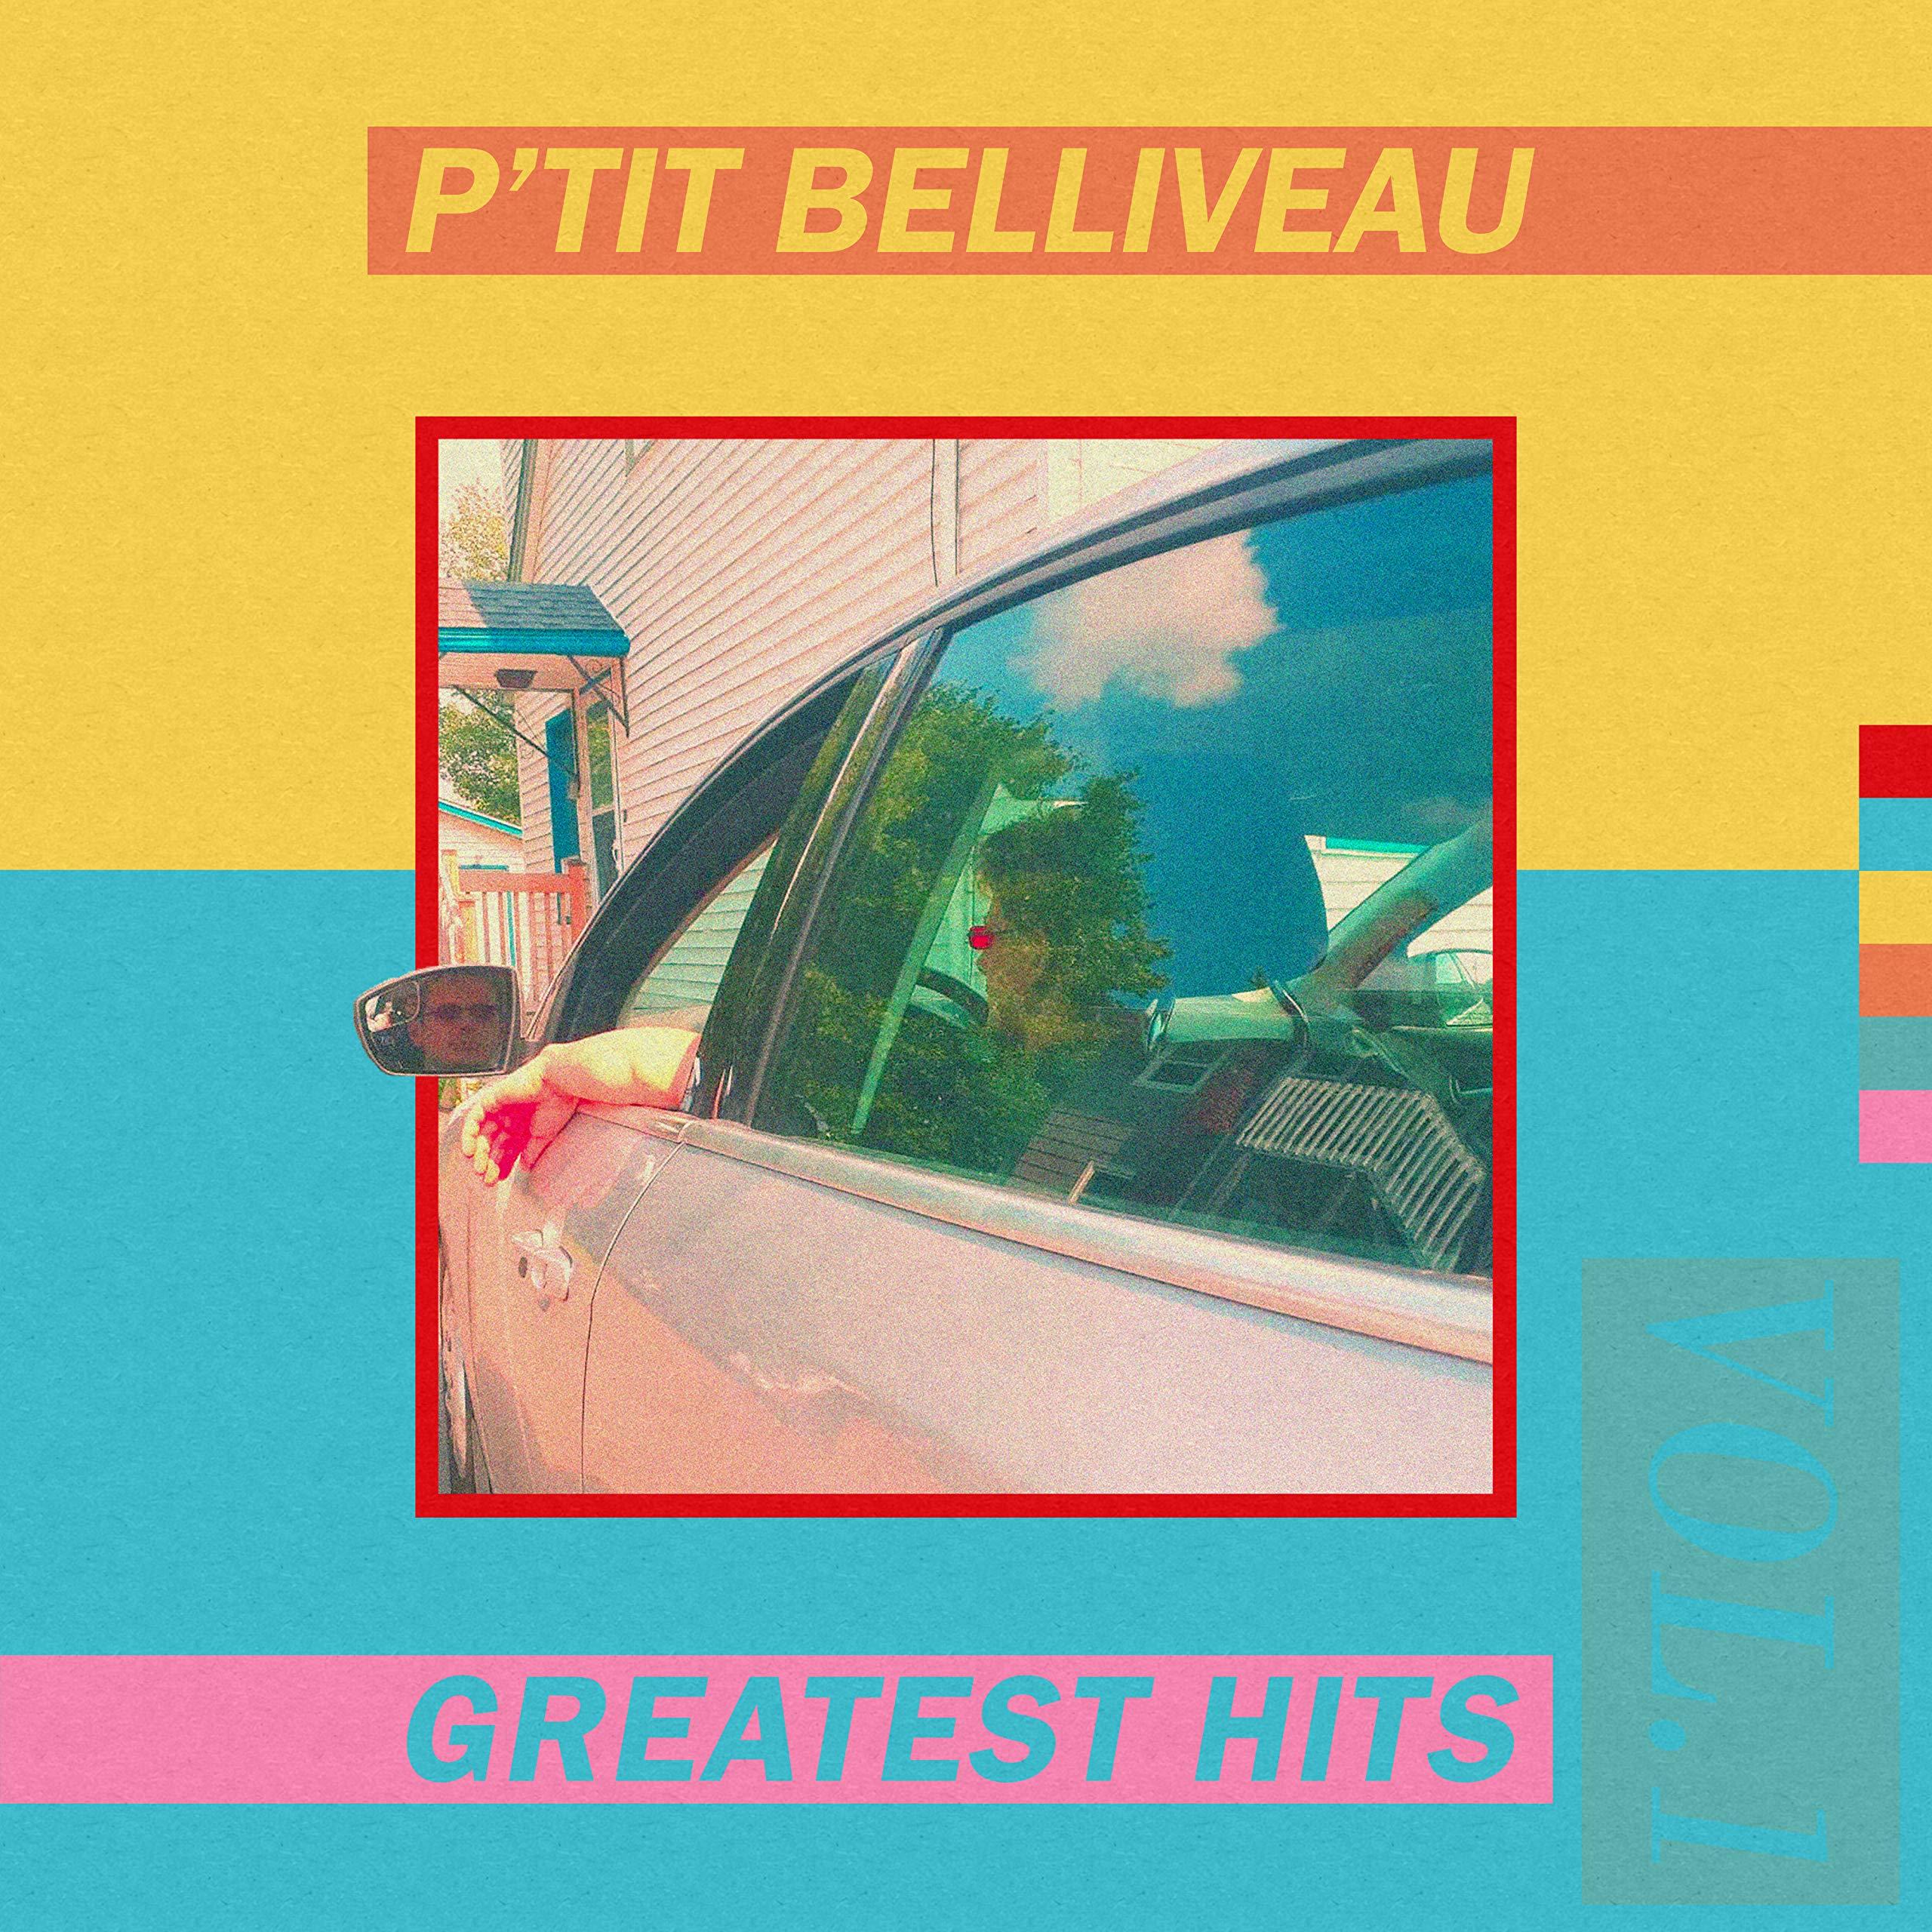 P'tit Belliveau - Greatest Hits Vol.1 (2020) [FLAC] Download